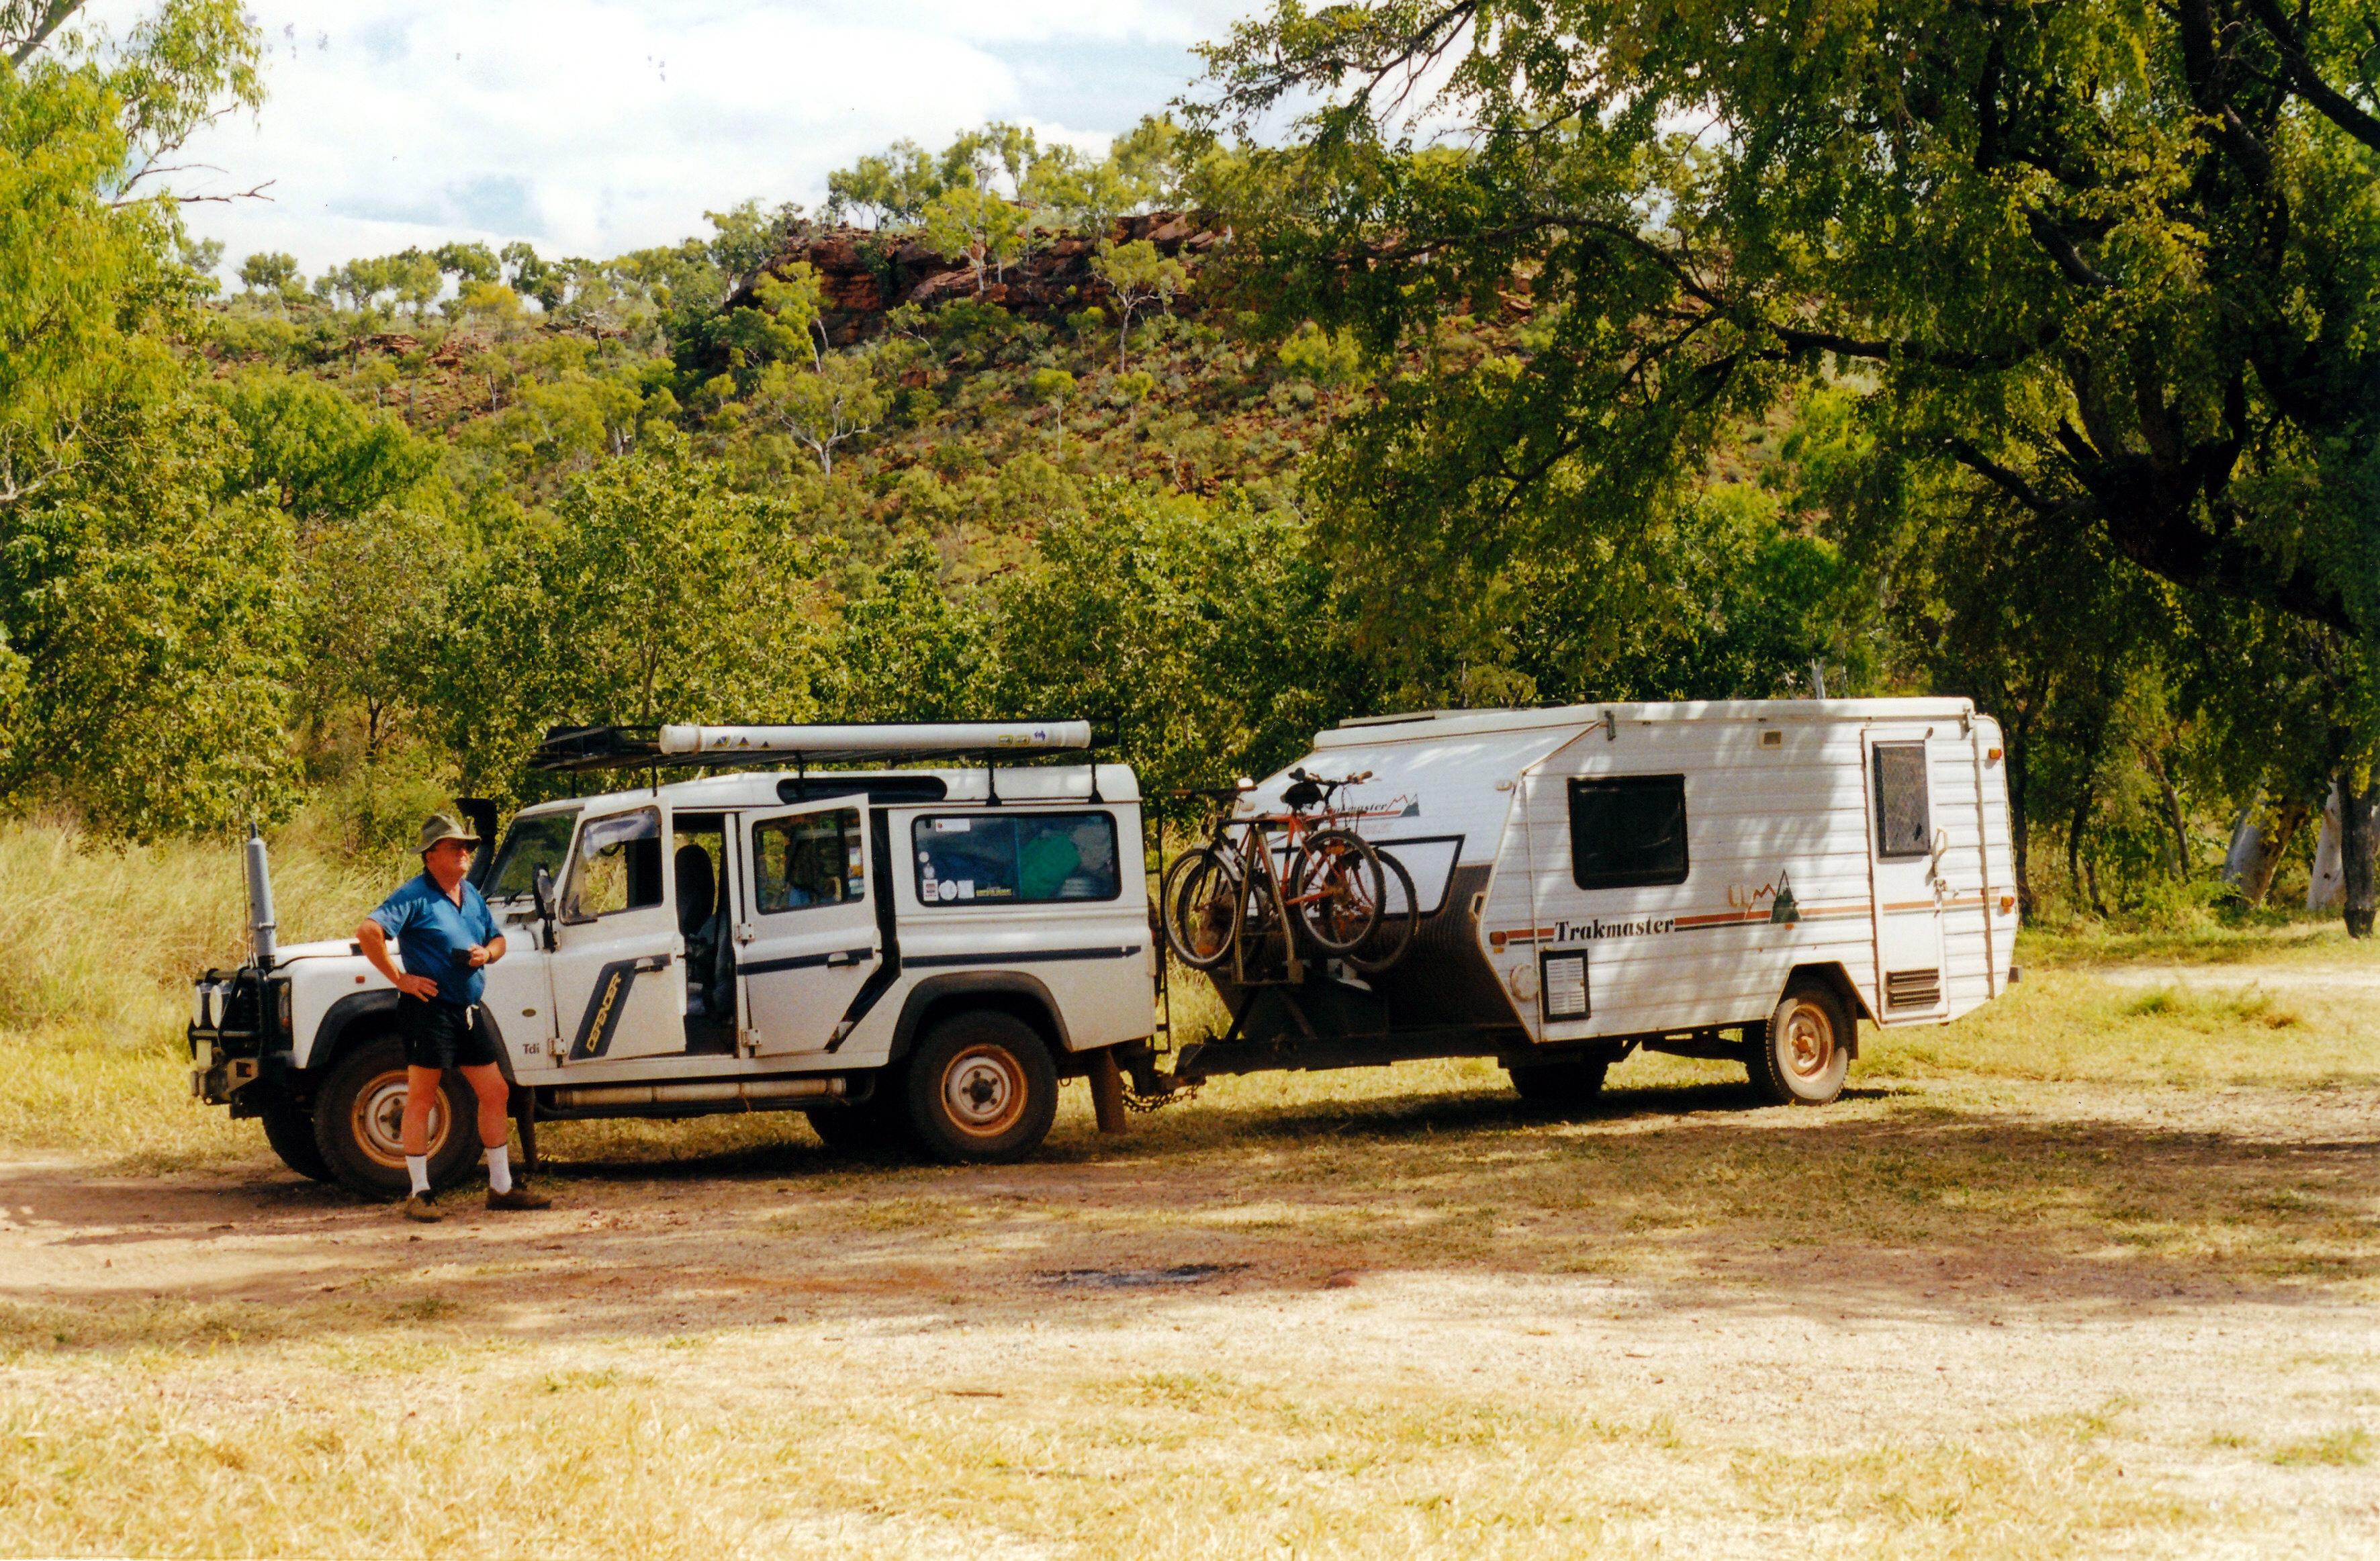 06-21-2000 06 jasper gorge camp area